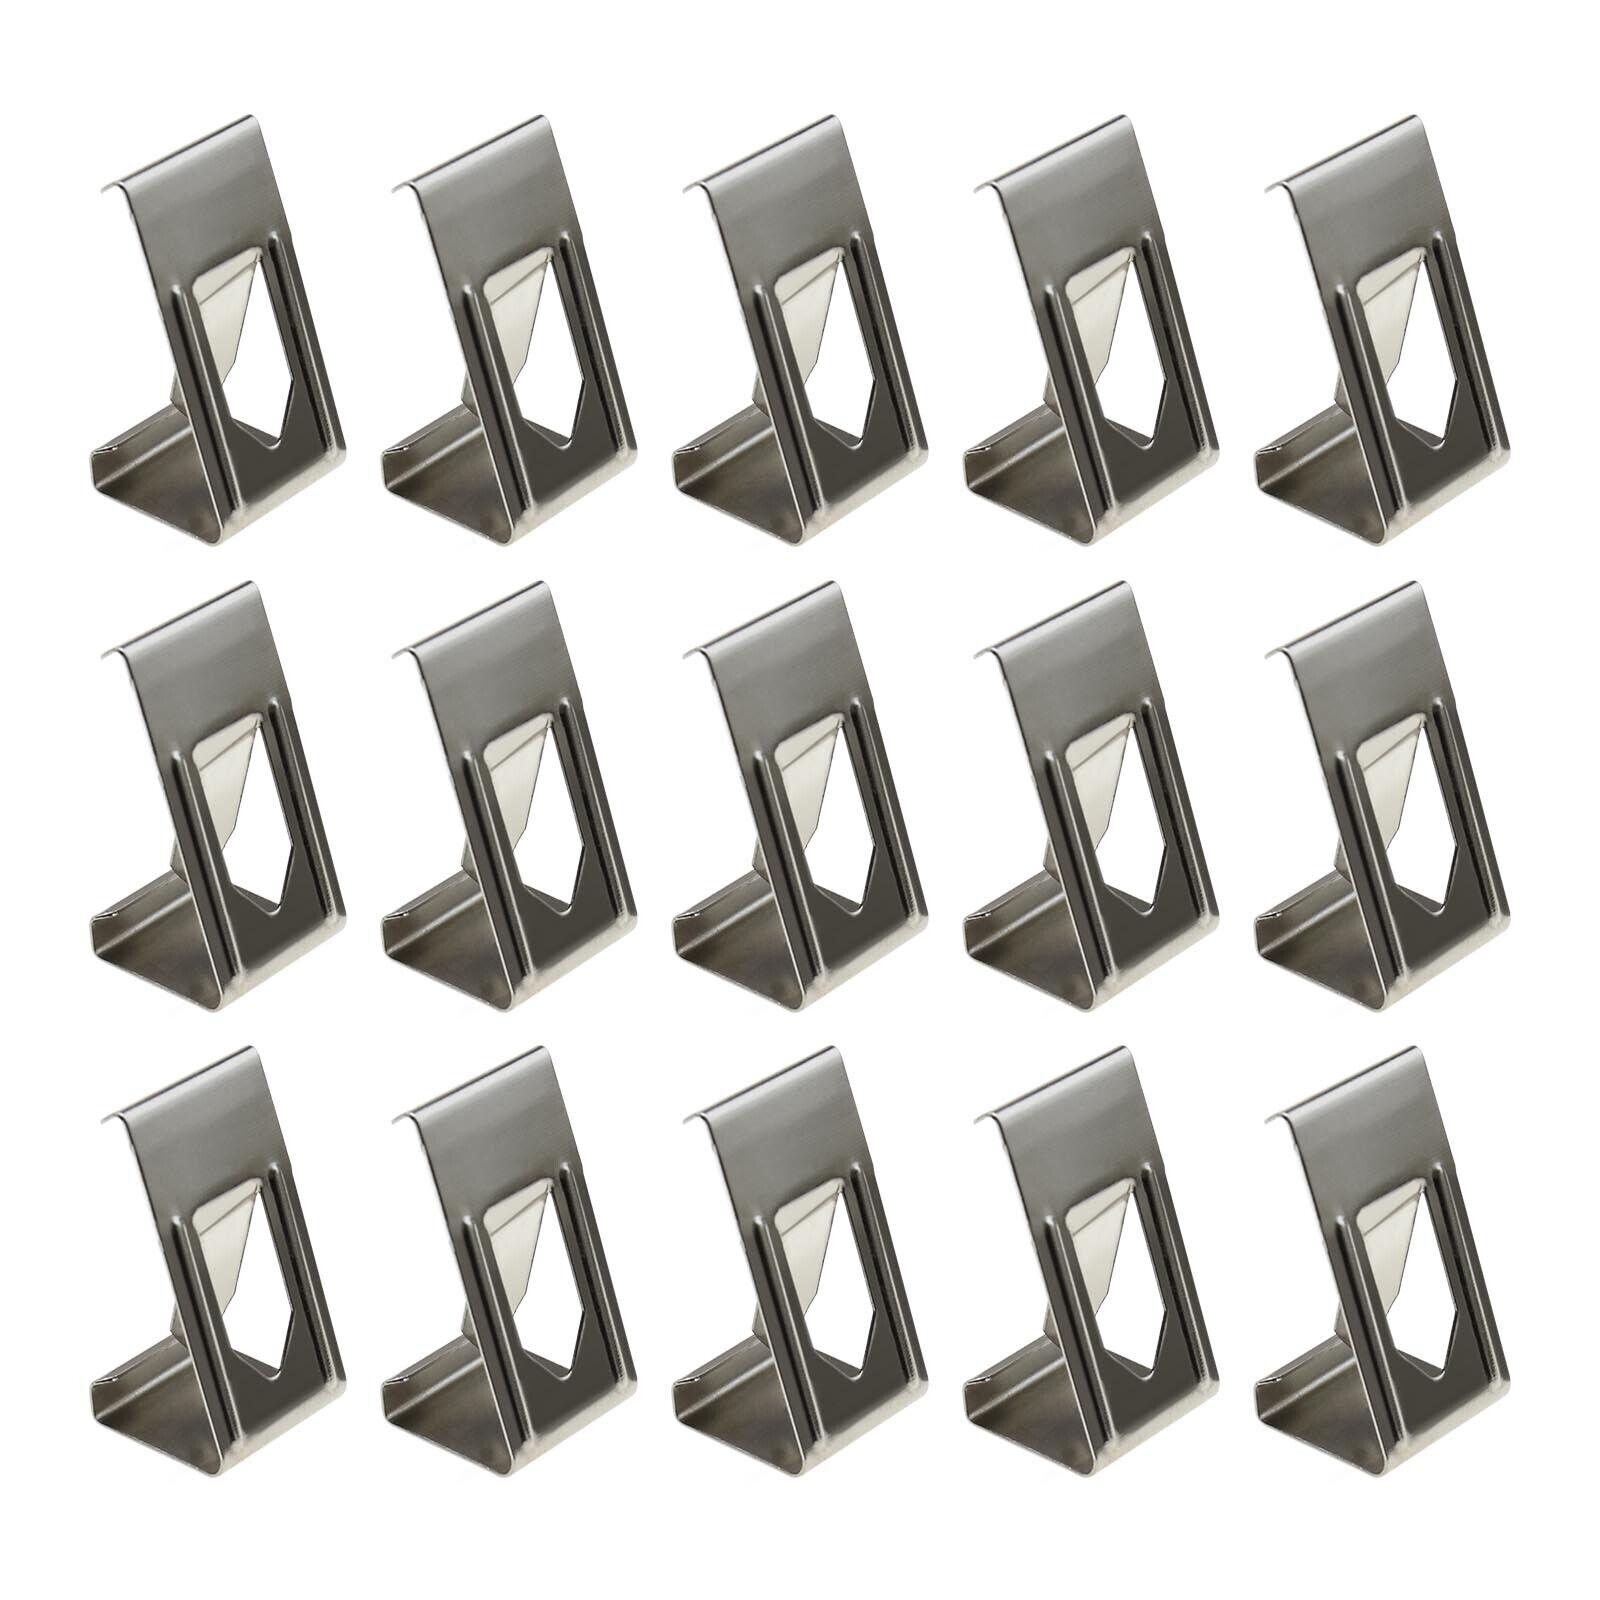 50x/100x 3D Printer Hot Bed Glass Platform Metal Spring Turn Clips Holder Silver